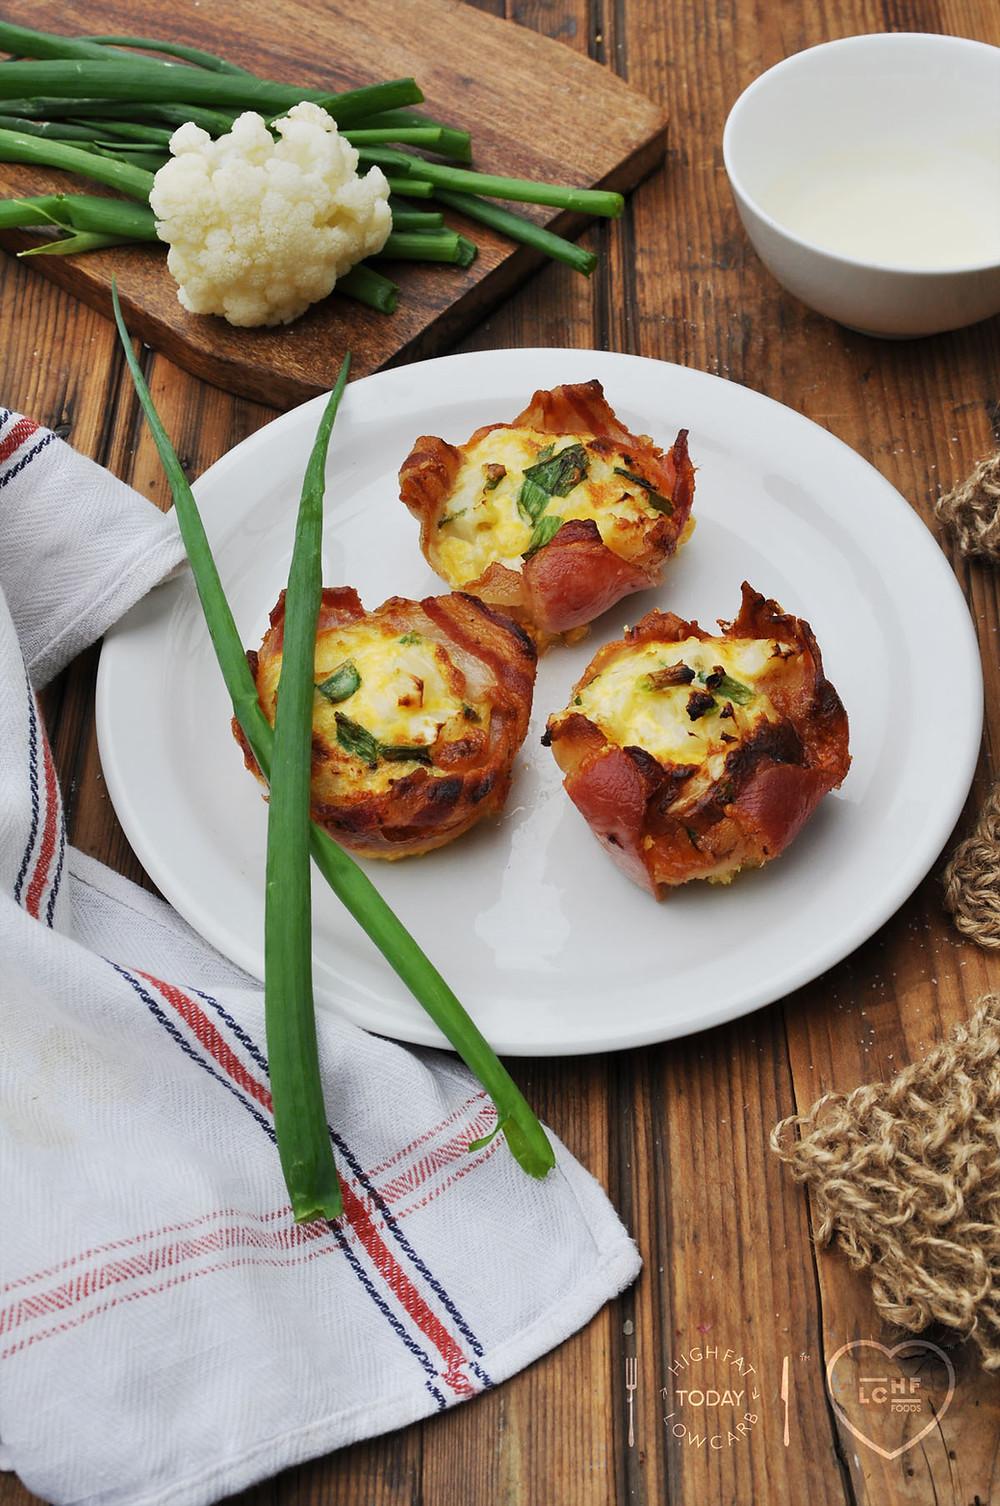 CYMATTATA served with spring onion garnish